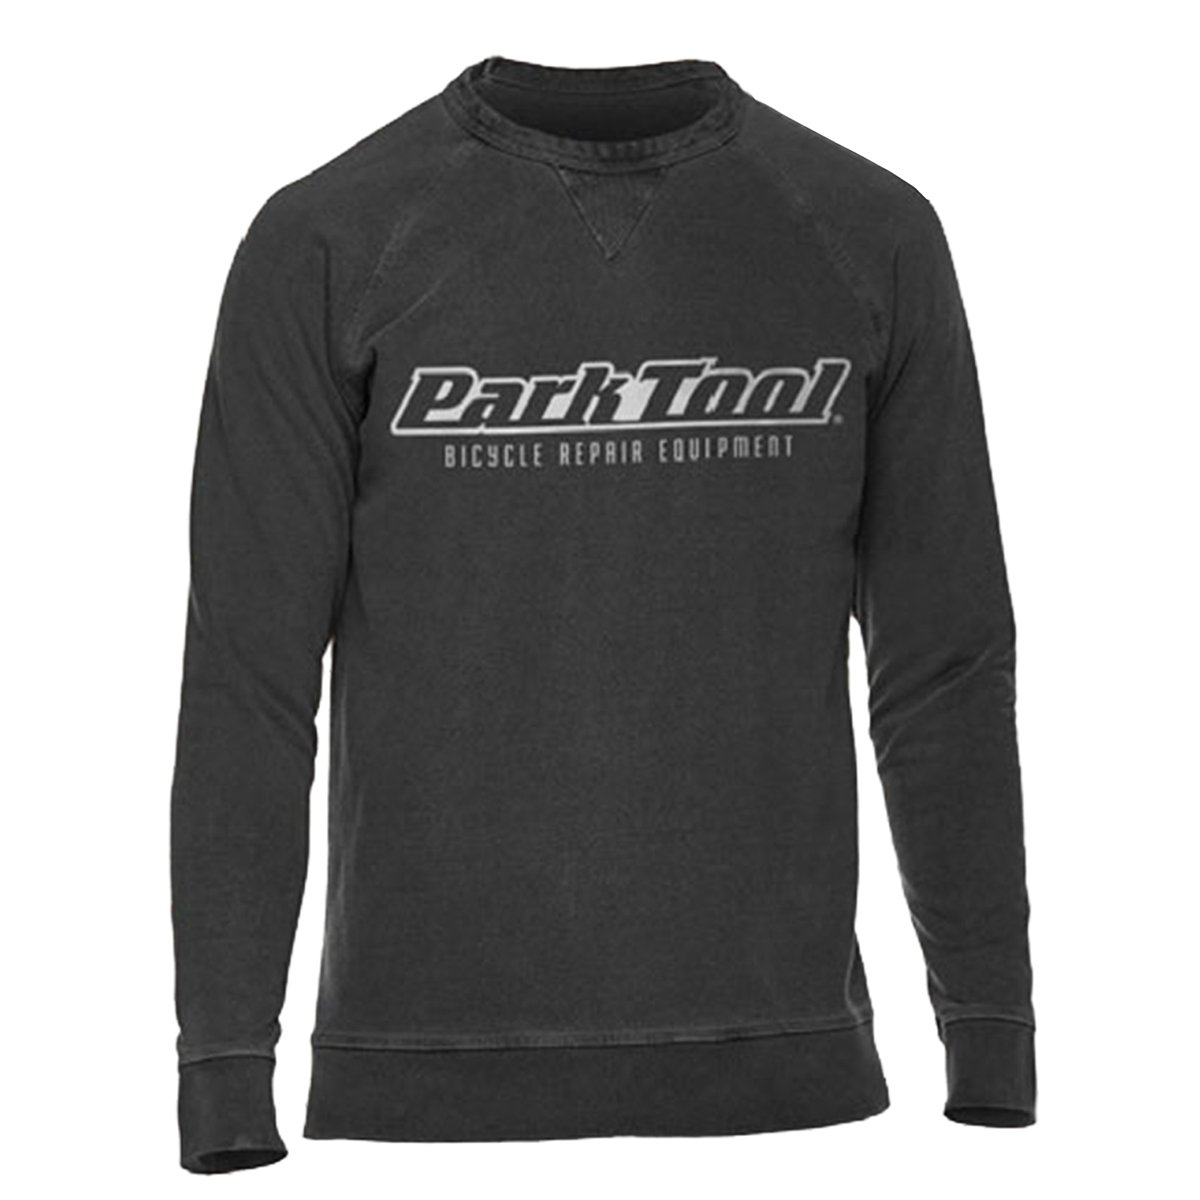 Park Tool WeatheROT Rundhalsausschnitt Longsleeve Sweatshirt